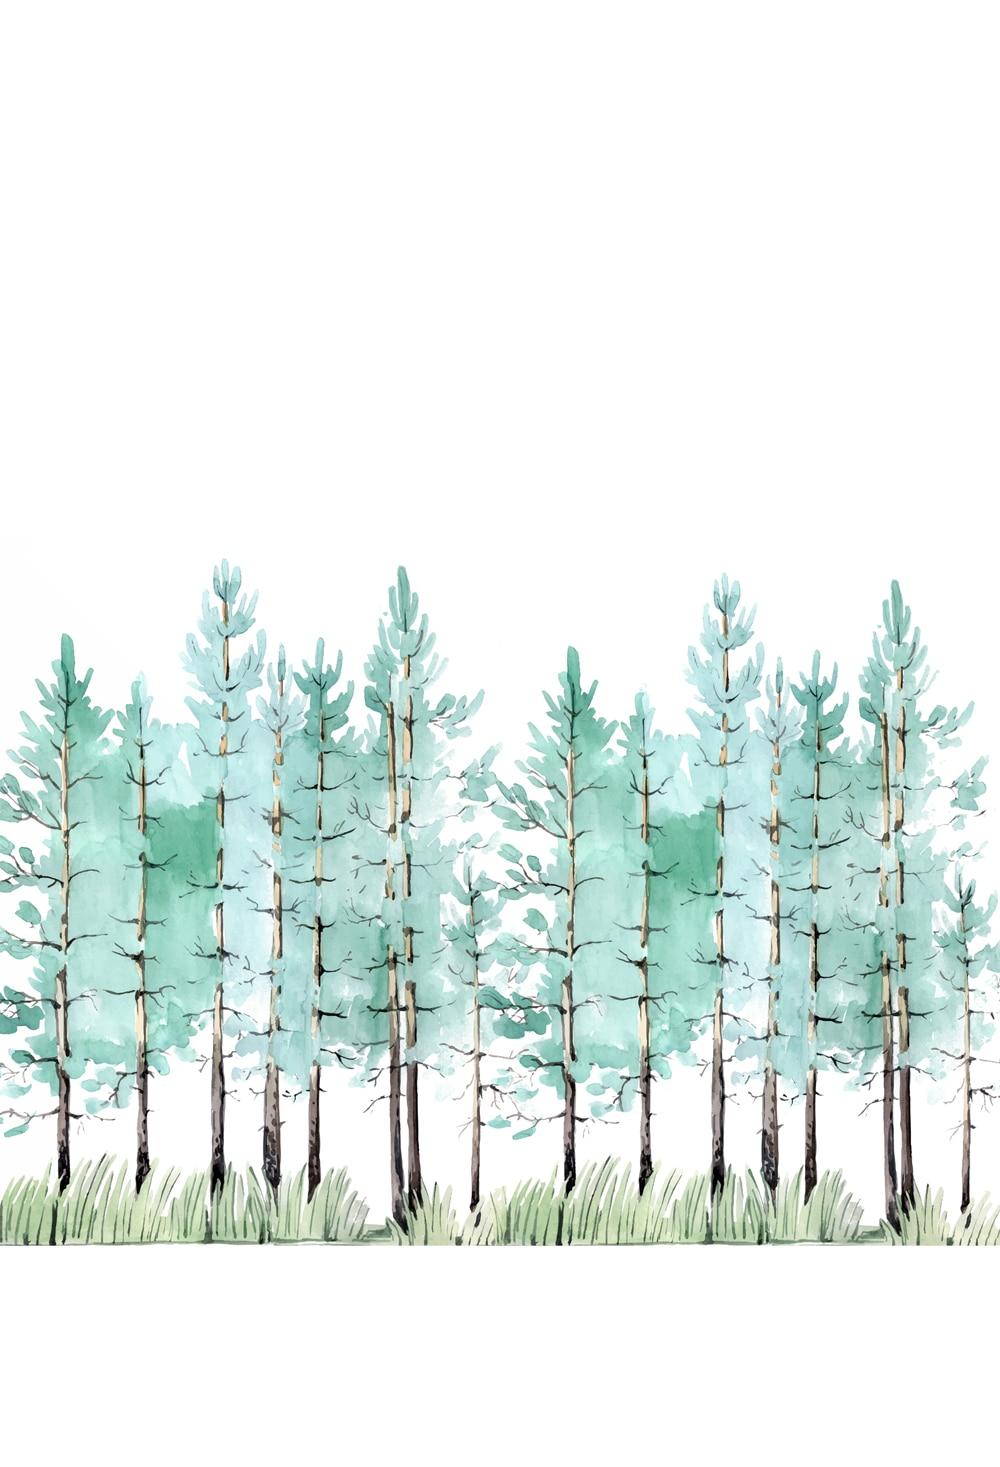 baby cartoon background tree birch forest photo prop for newborns portrait photography digital printing backdrops kid XT-6602